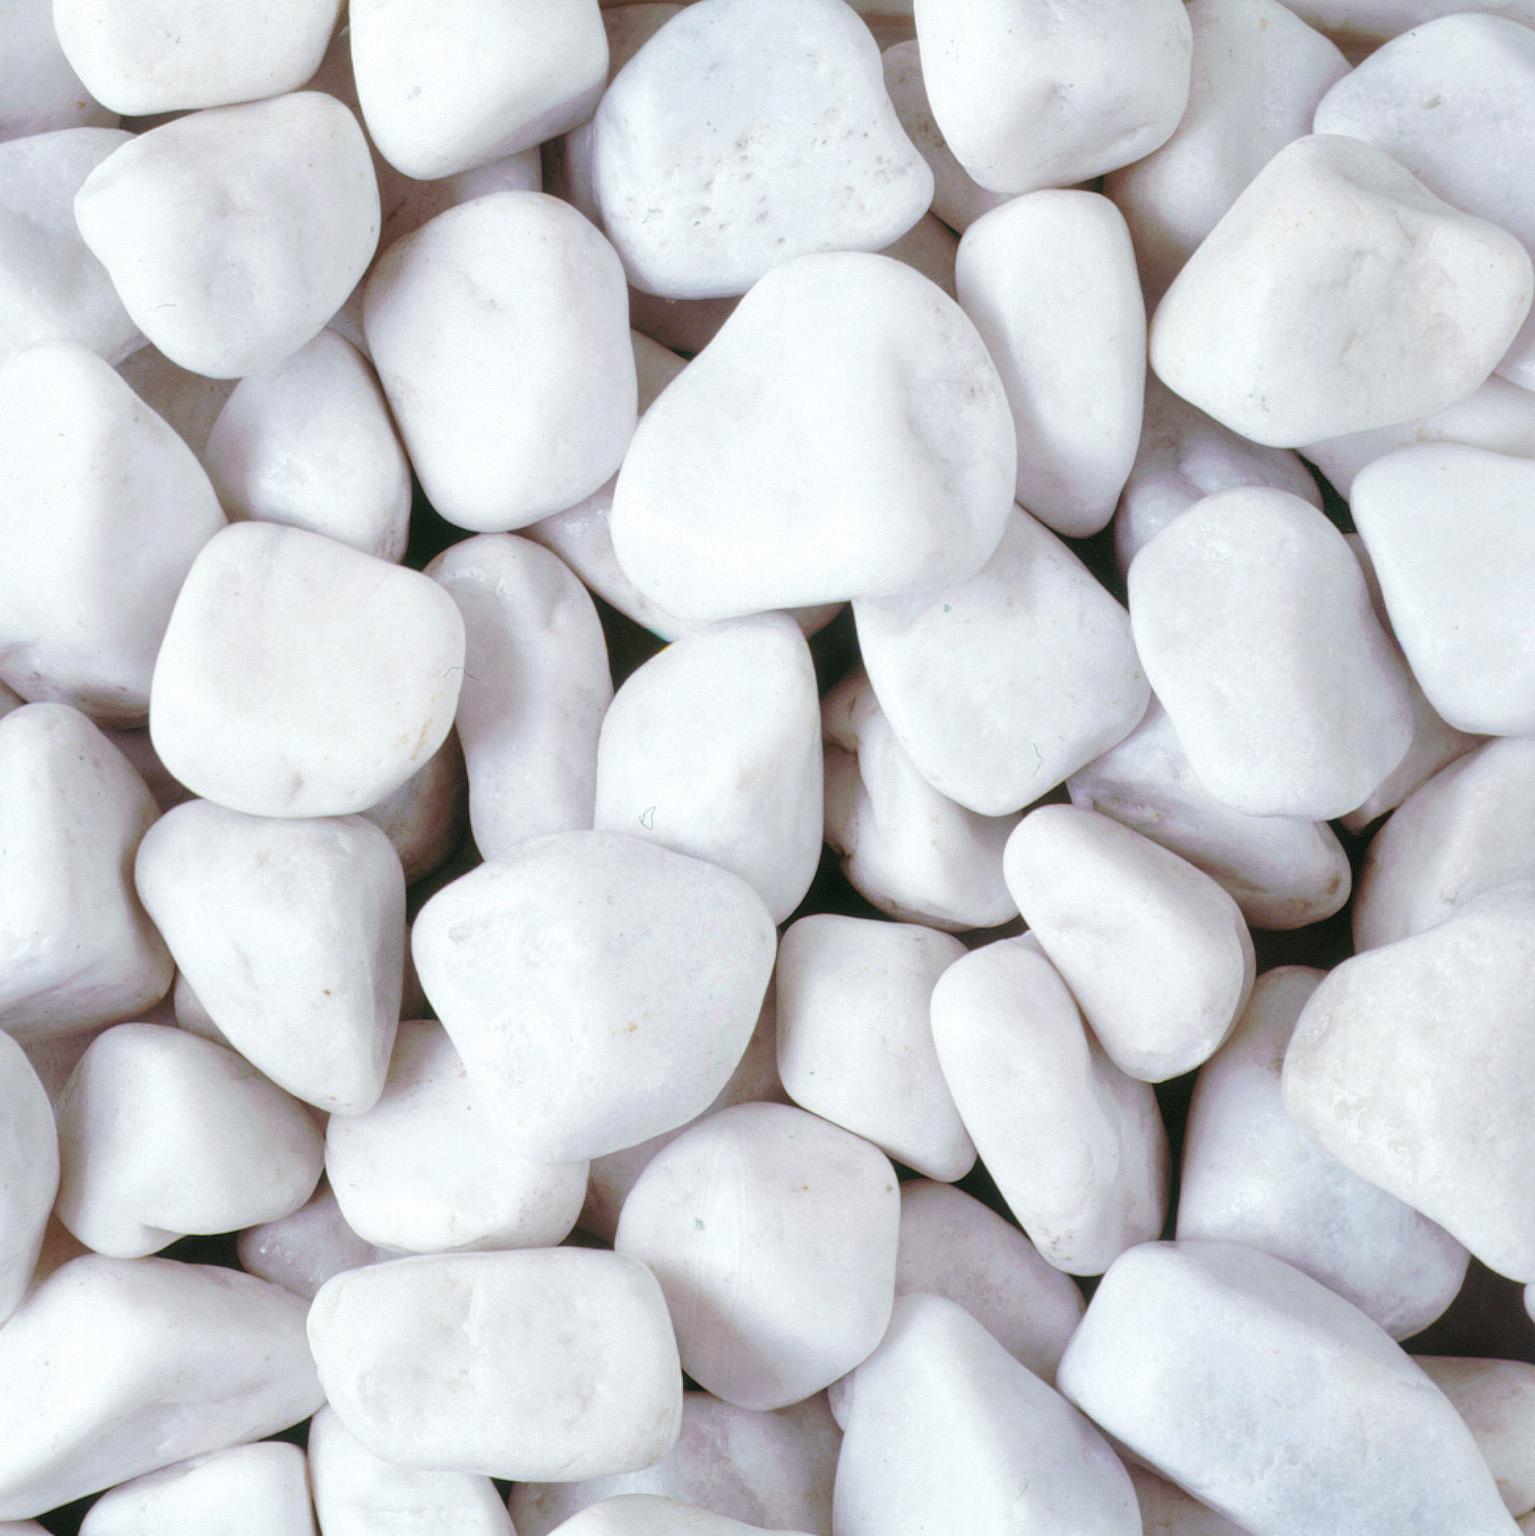 White stones photo